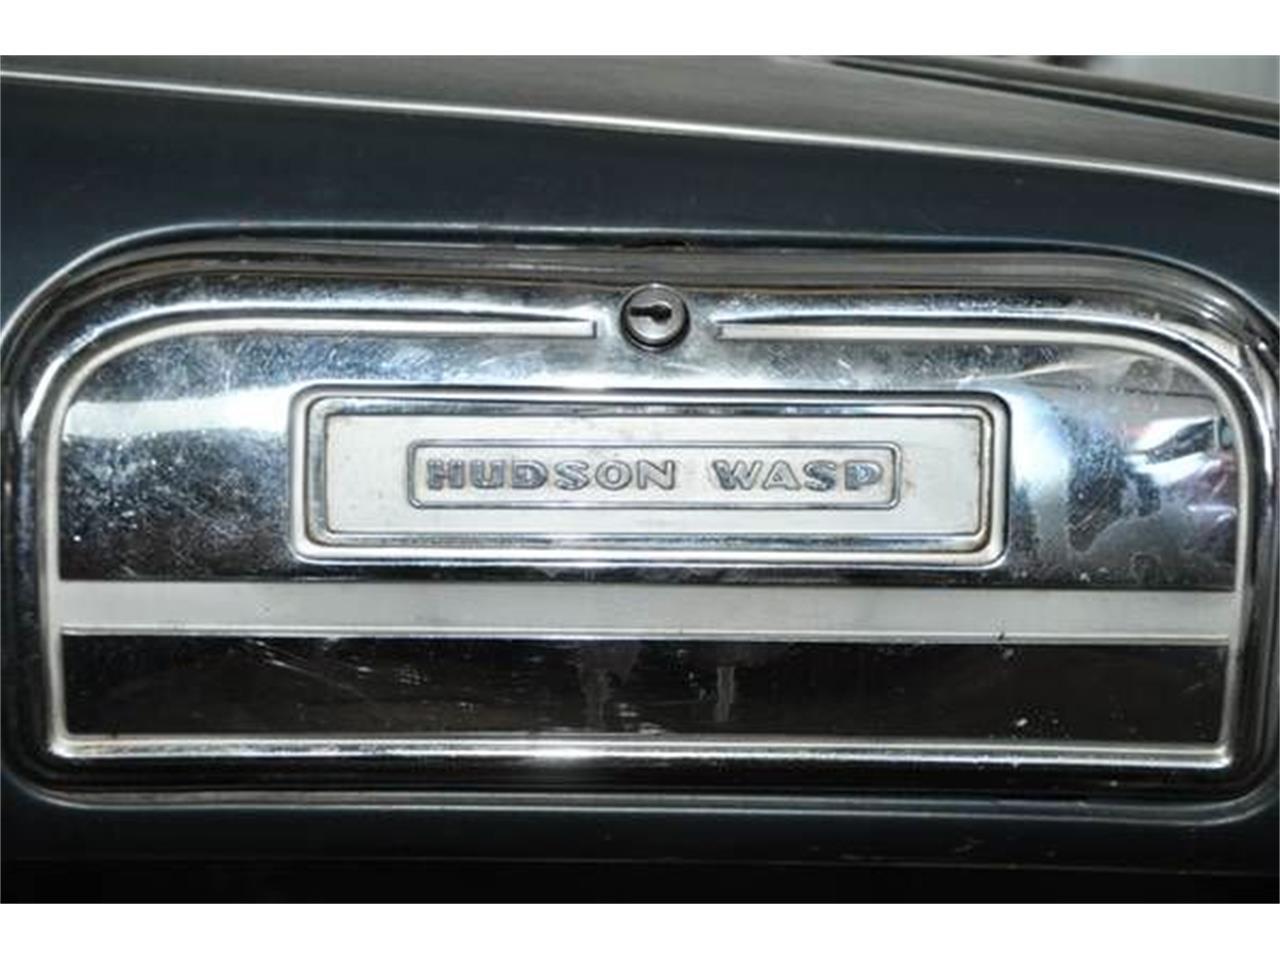 1953 Hudson Wasp (CC-1375690) for sale in Cadillac, Michigan